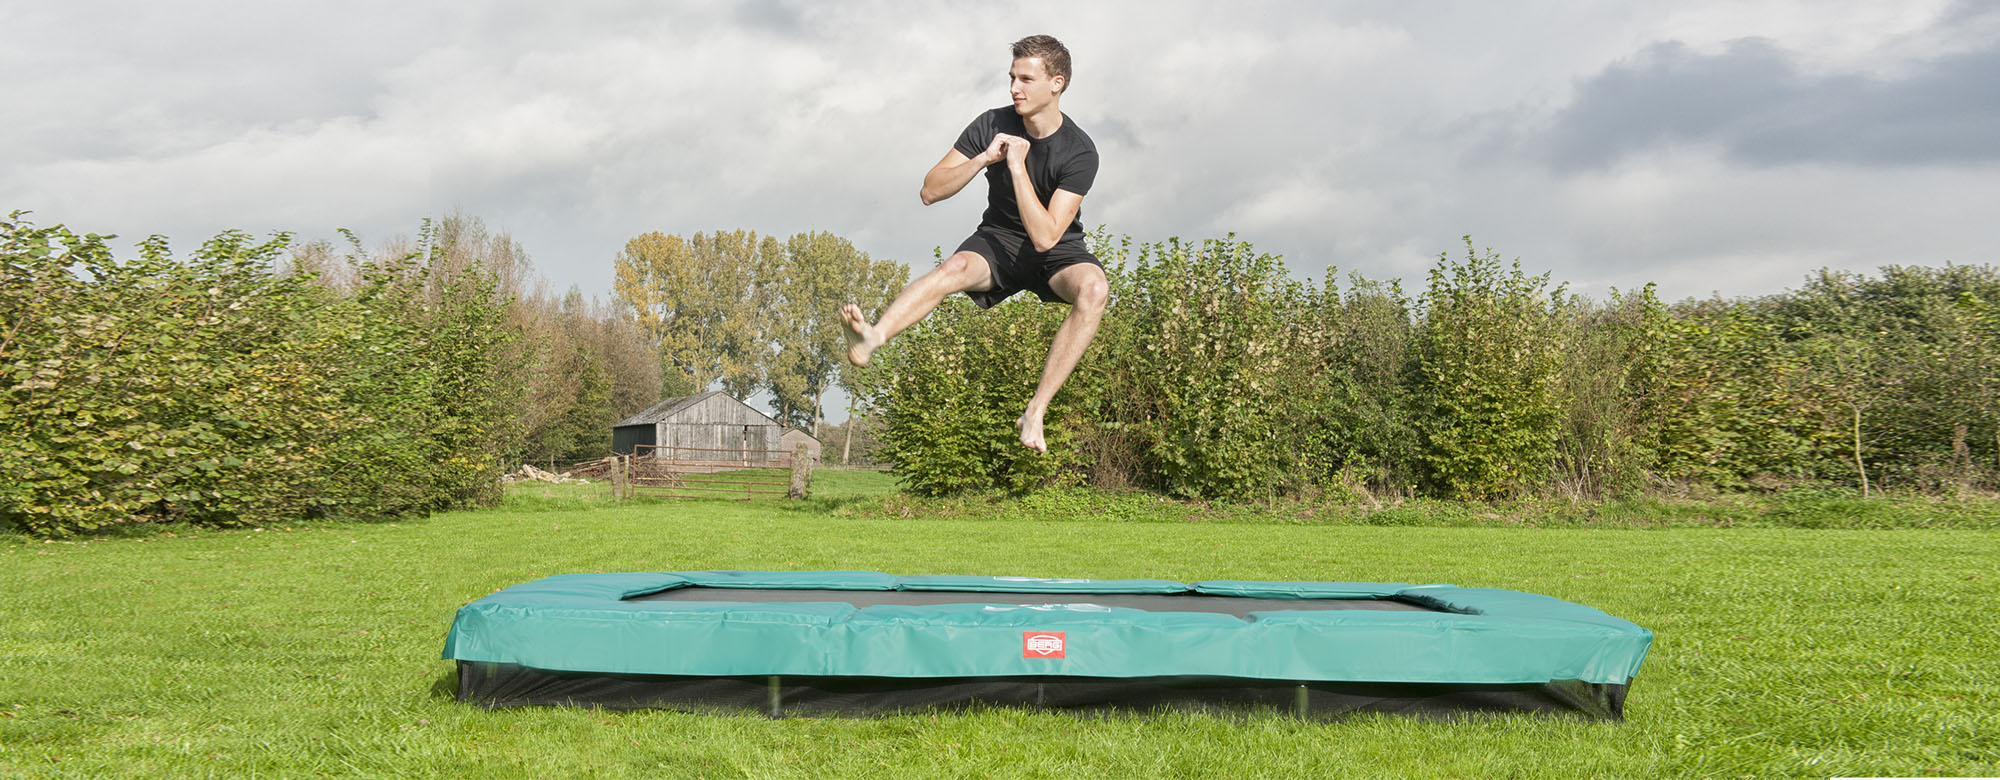 Trampolin Sport ist auch für Männer - trampolin-profi.de